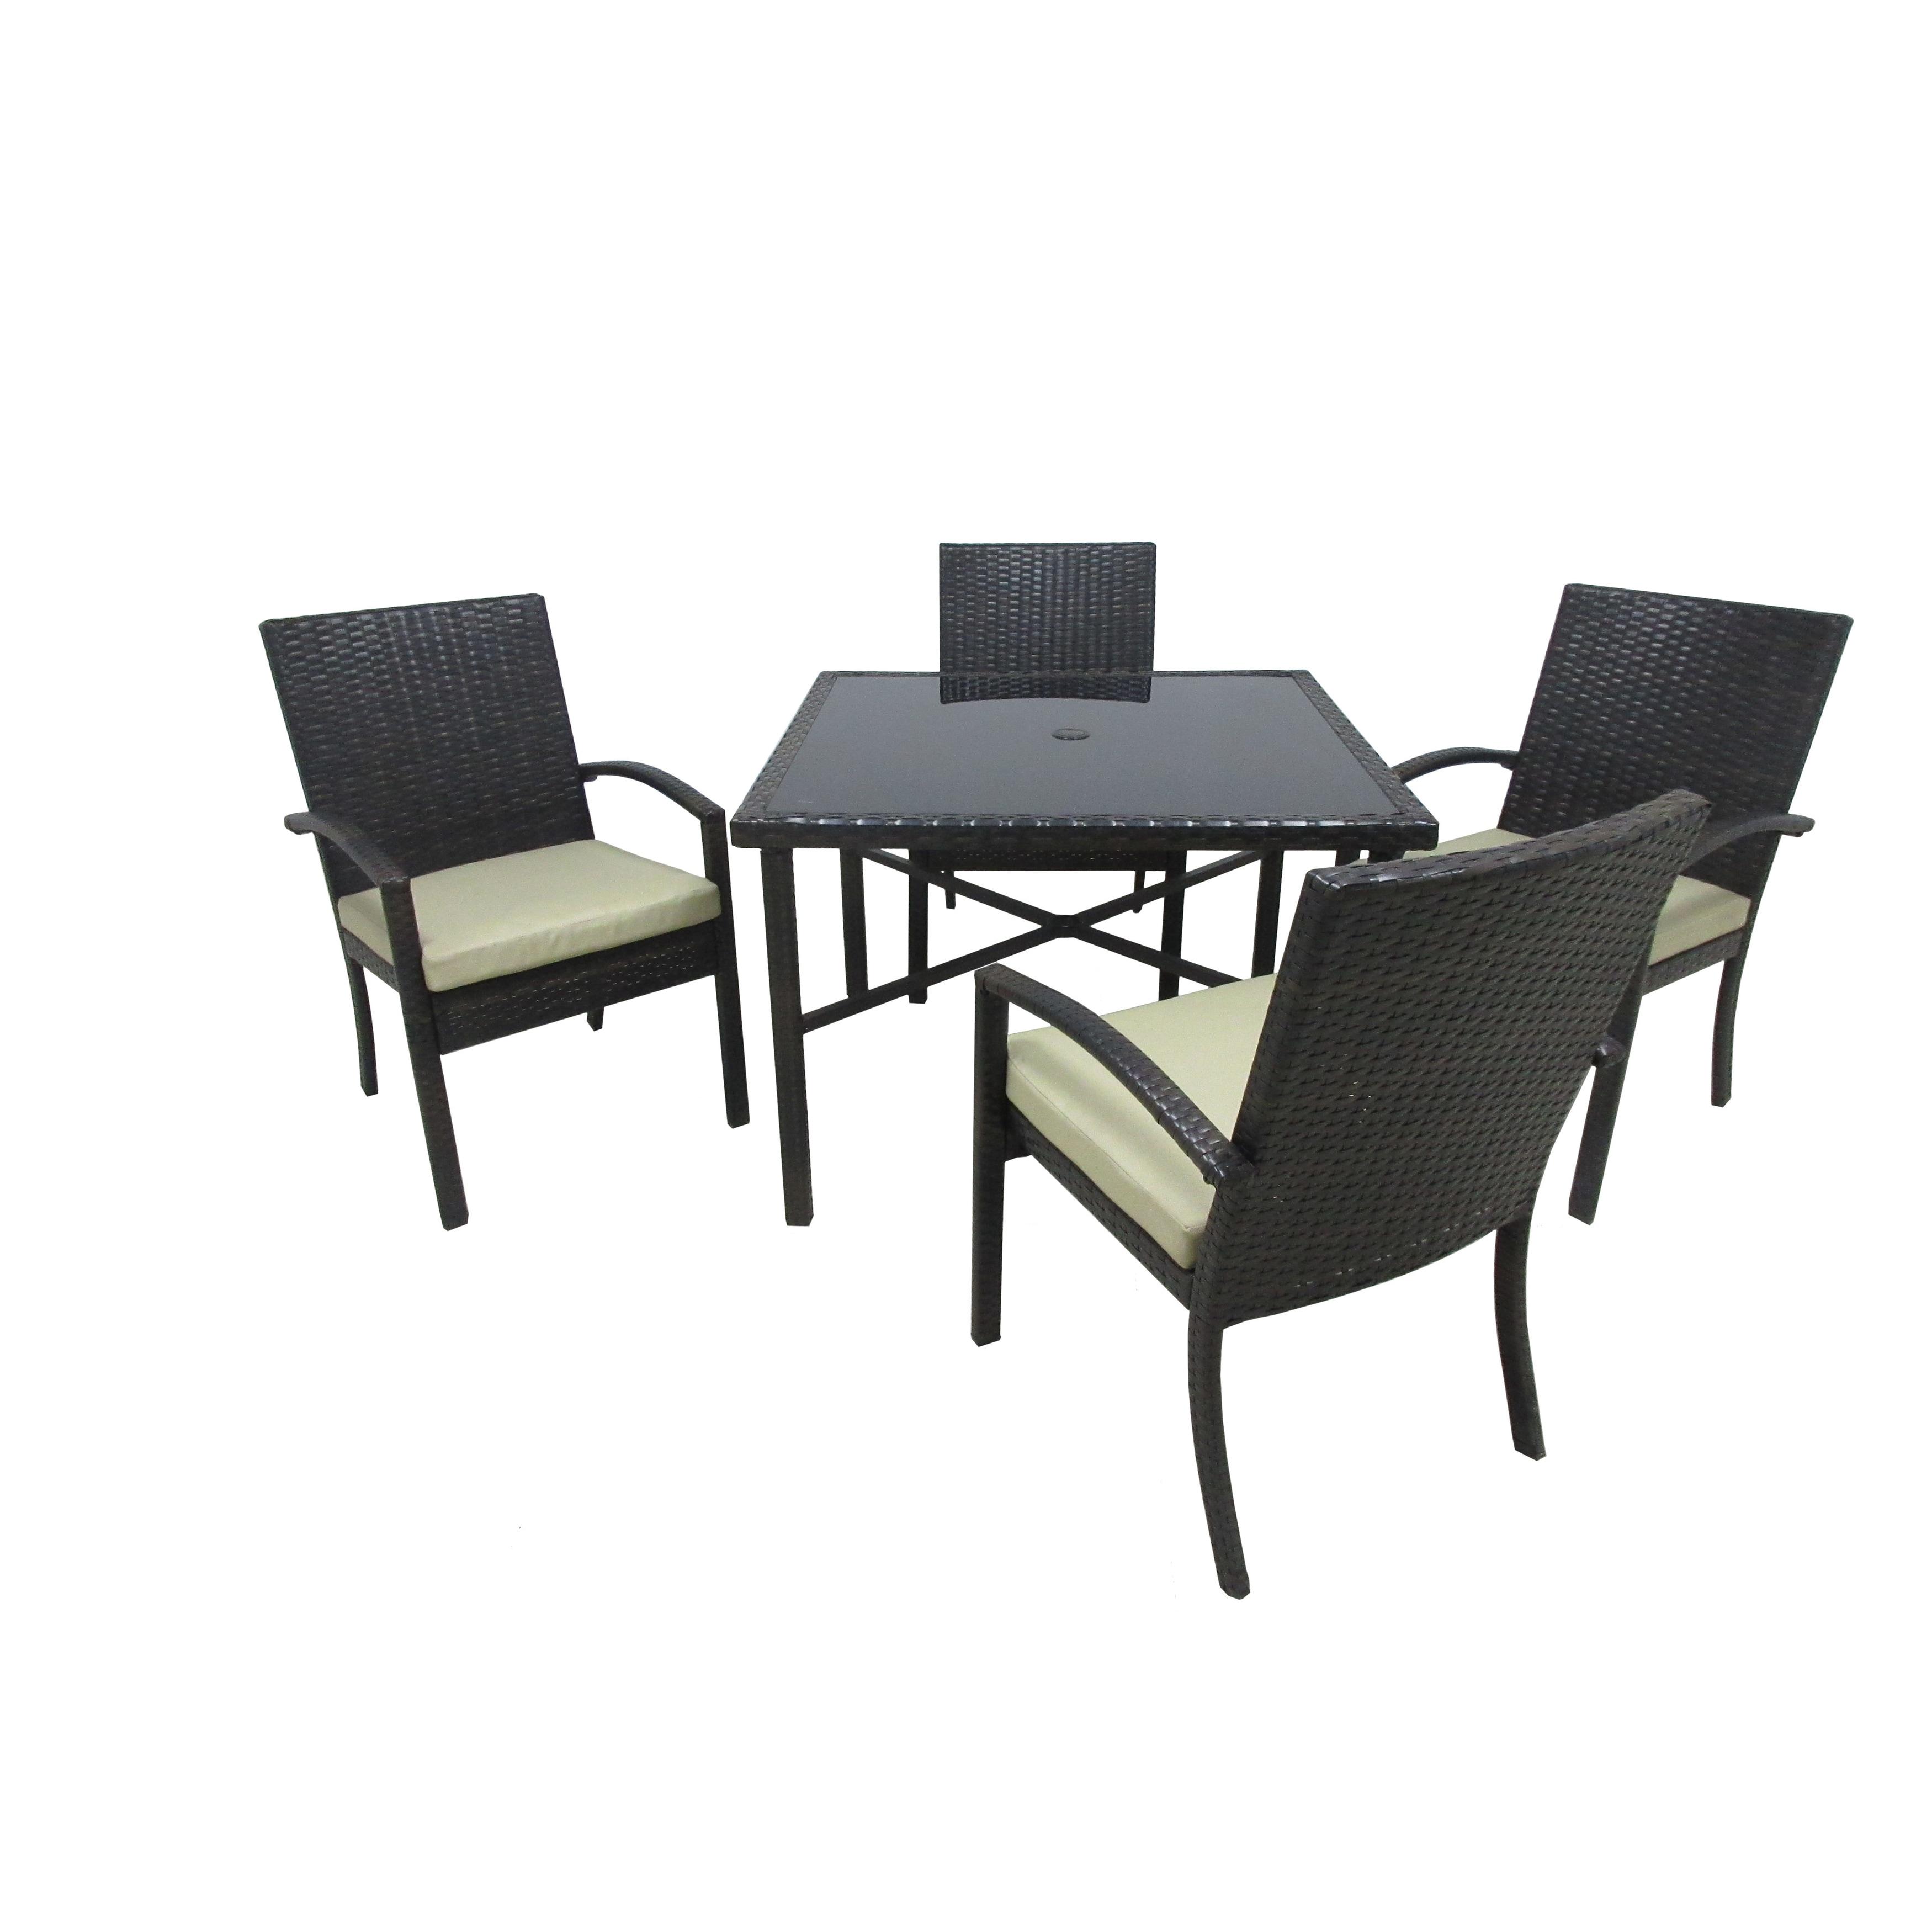 International Chelsea 5-Piece Outdoor Patio Dining Set (B...